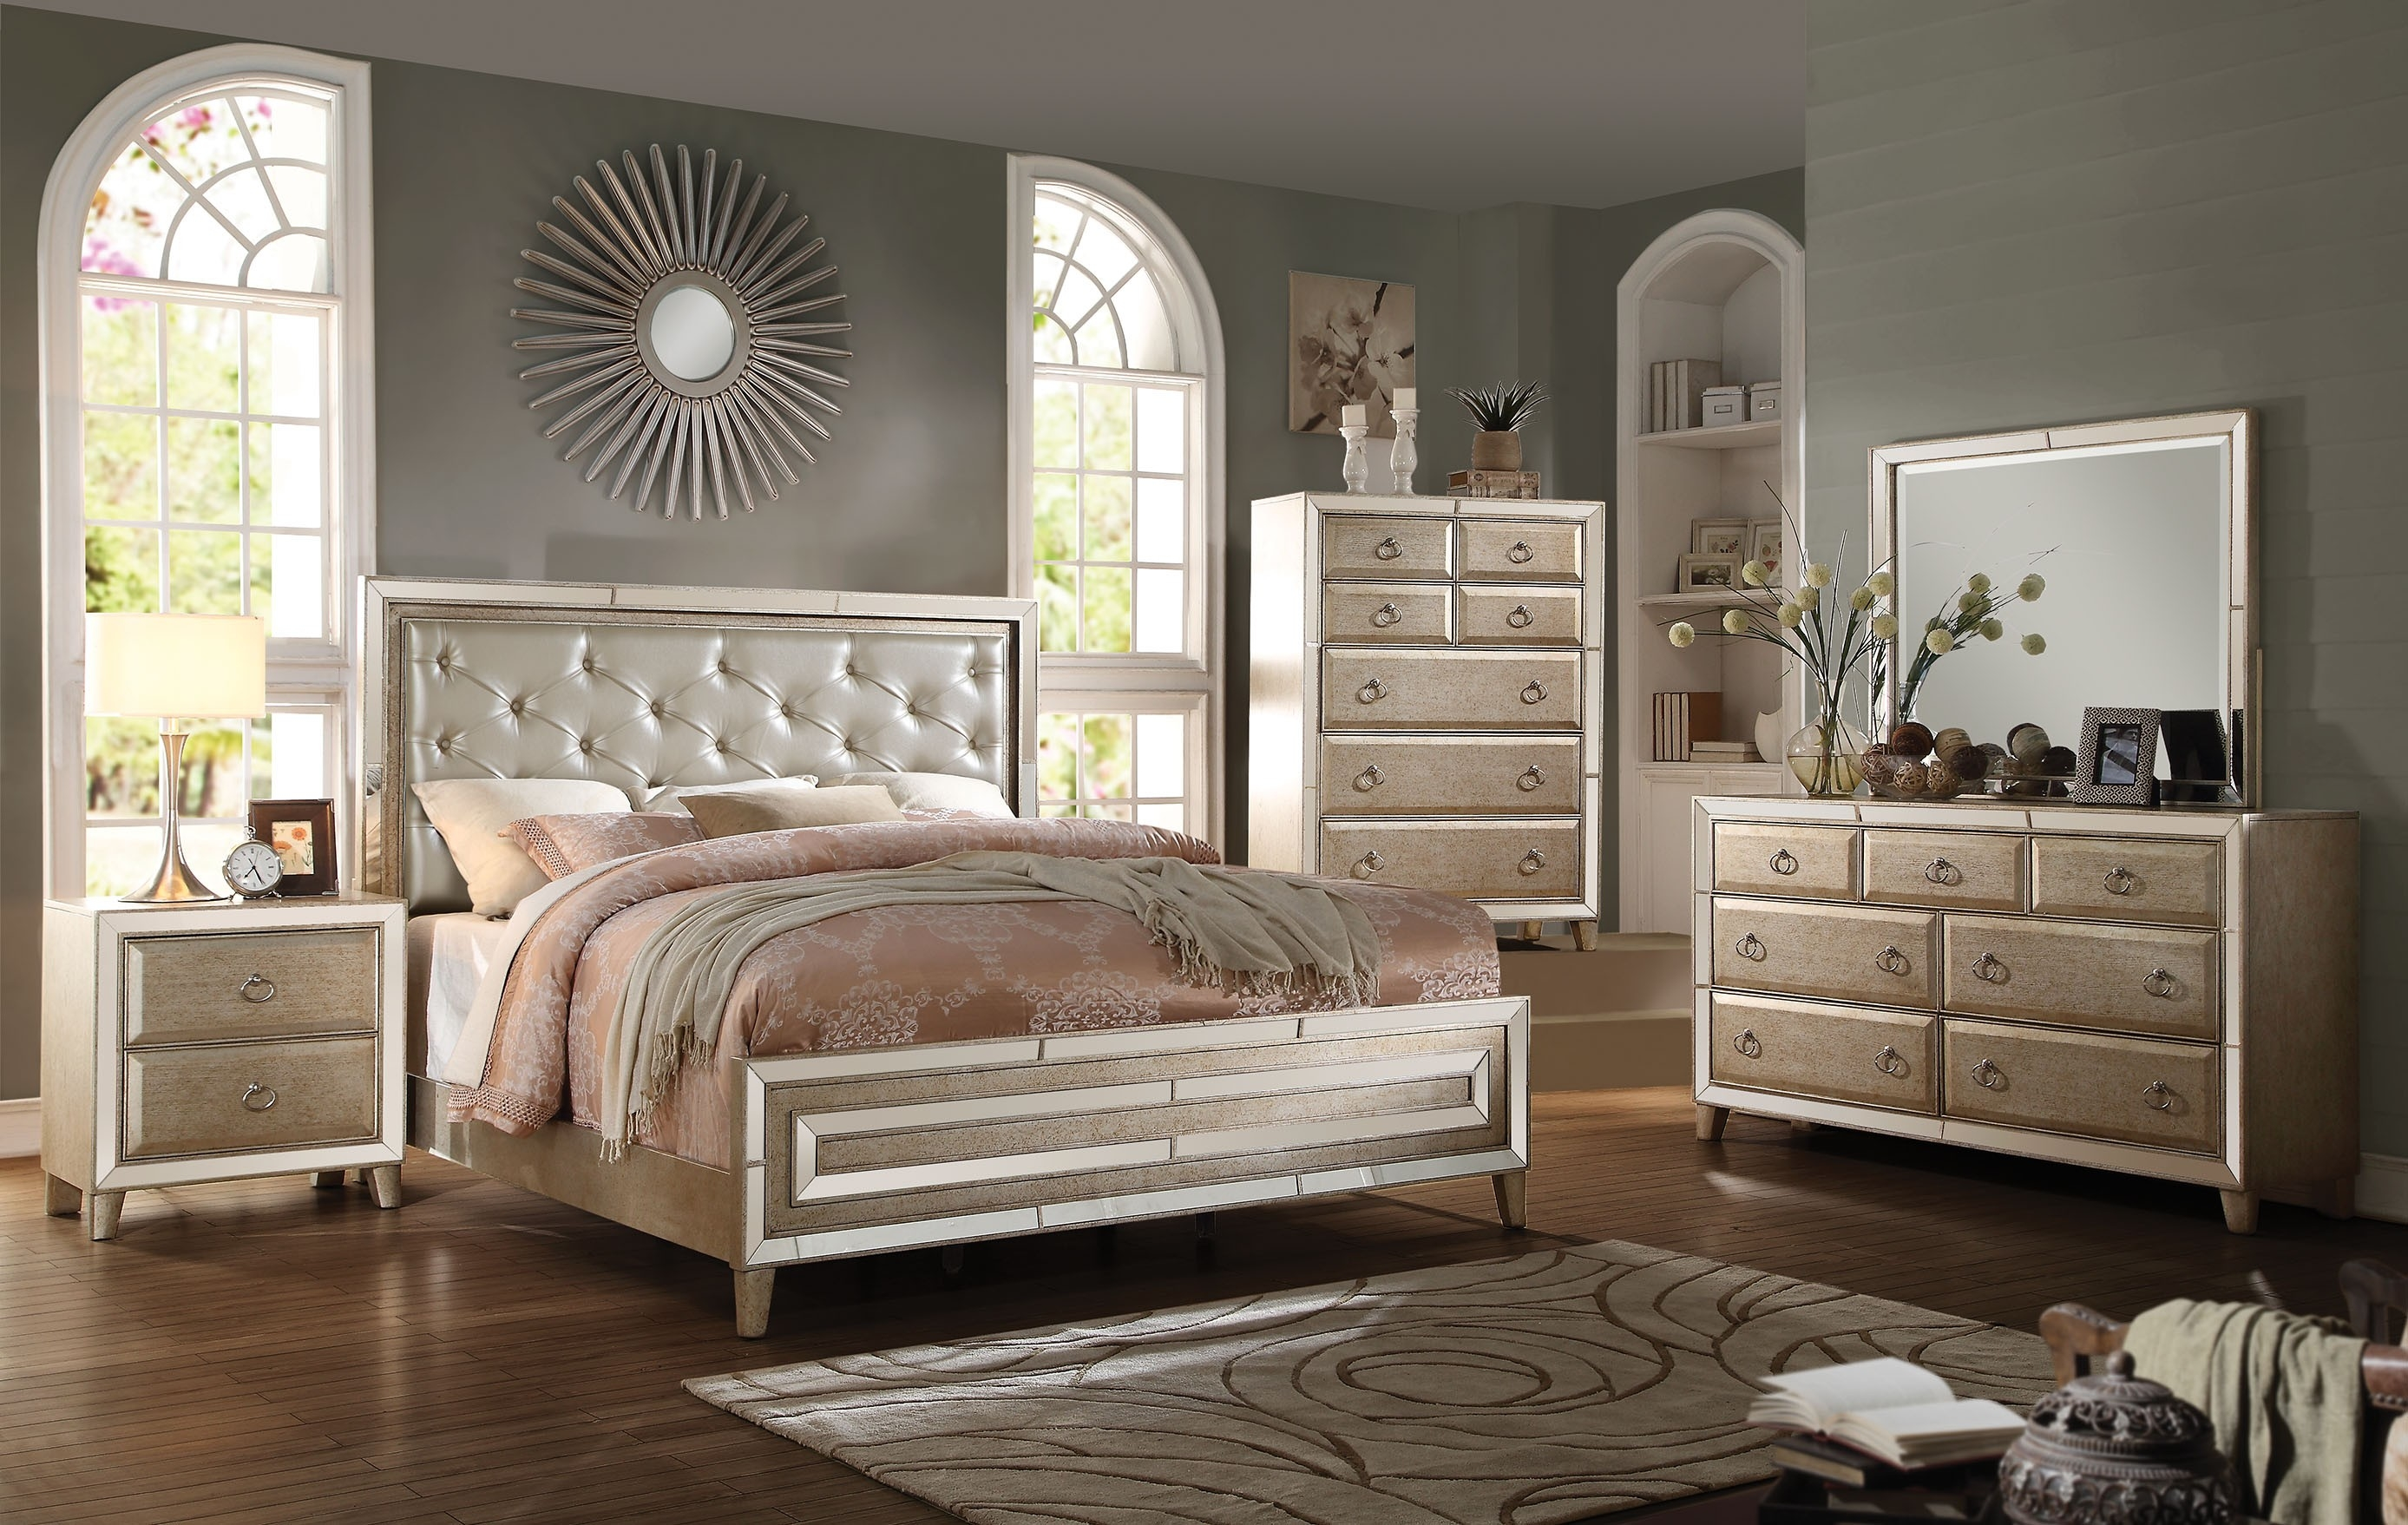 بالصور احلى غرف نوم , اجمل موديلات غرف النوم 3106 6